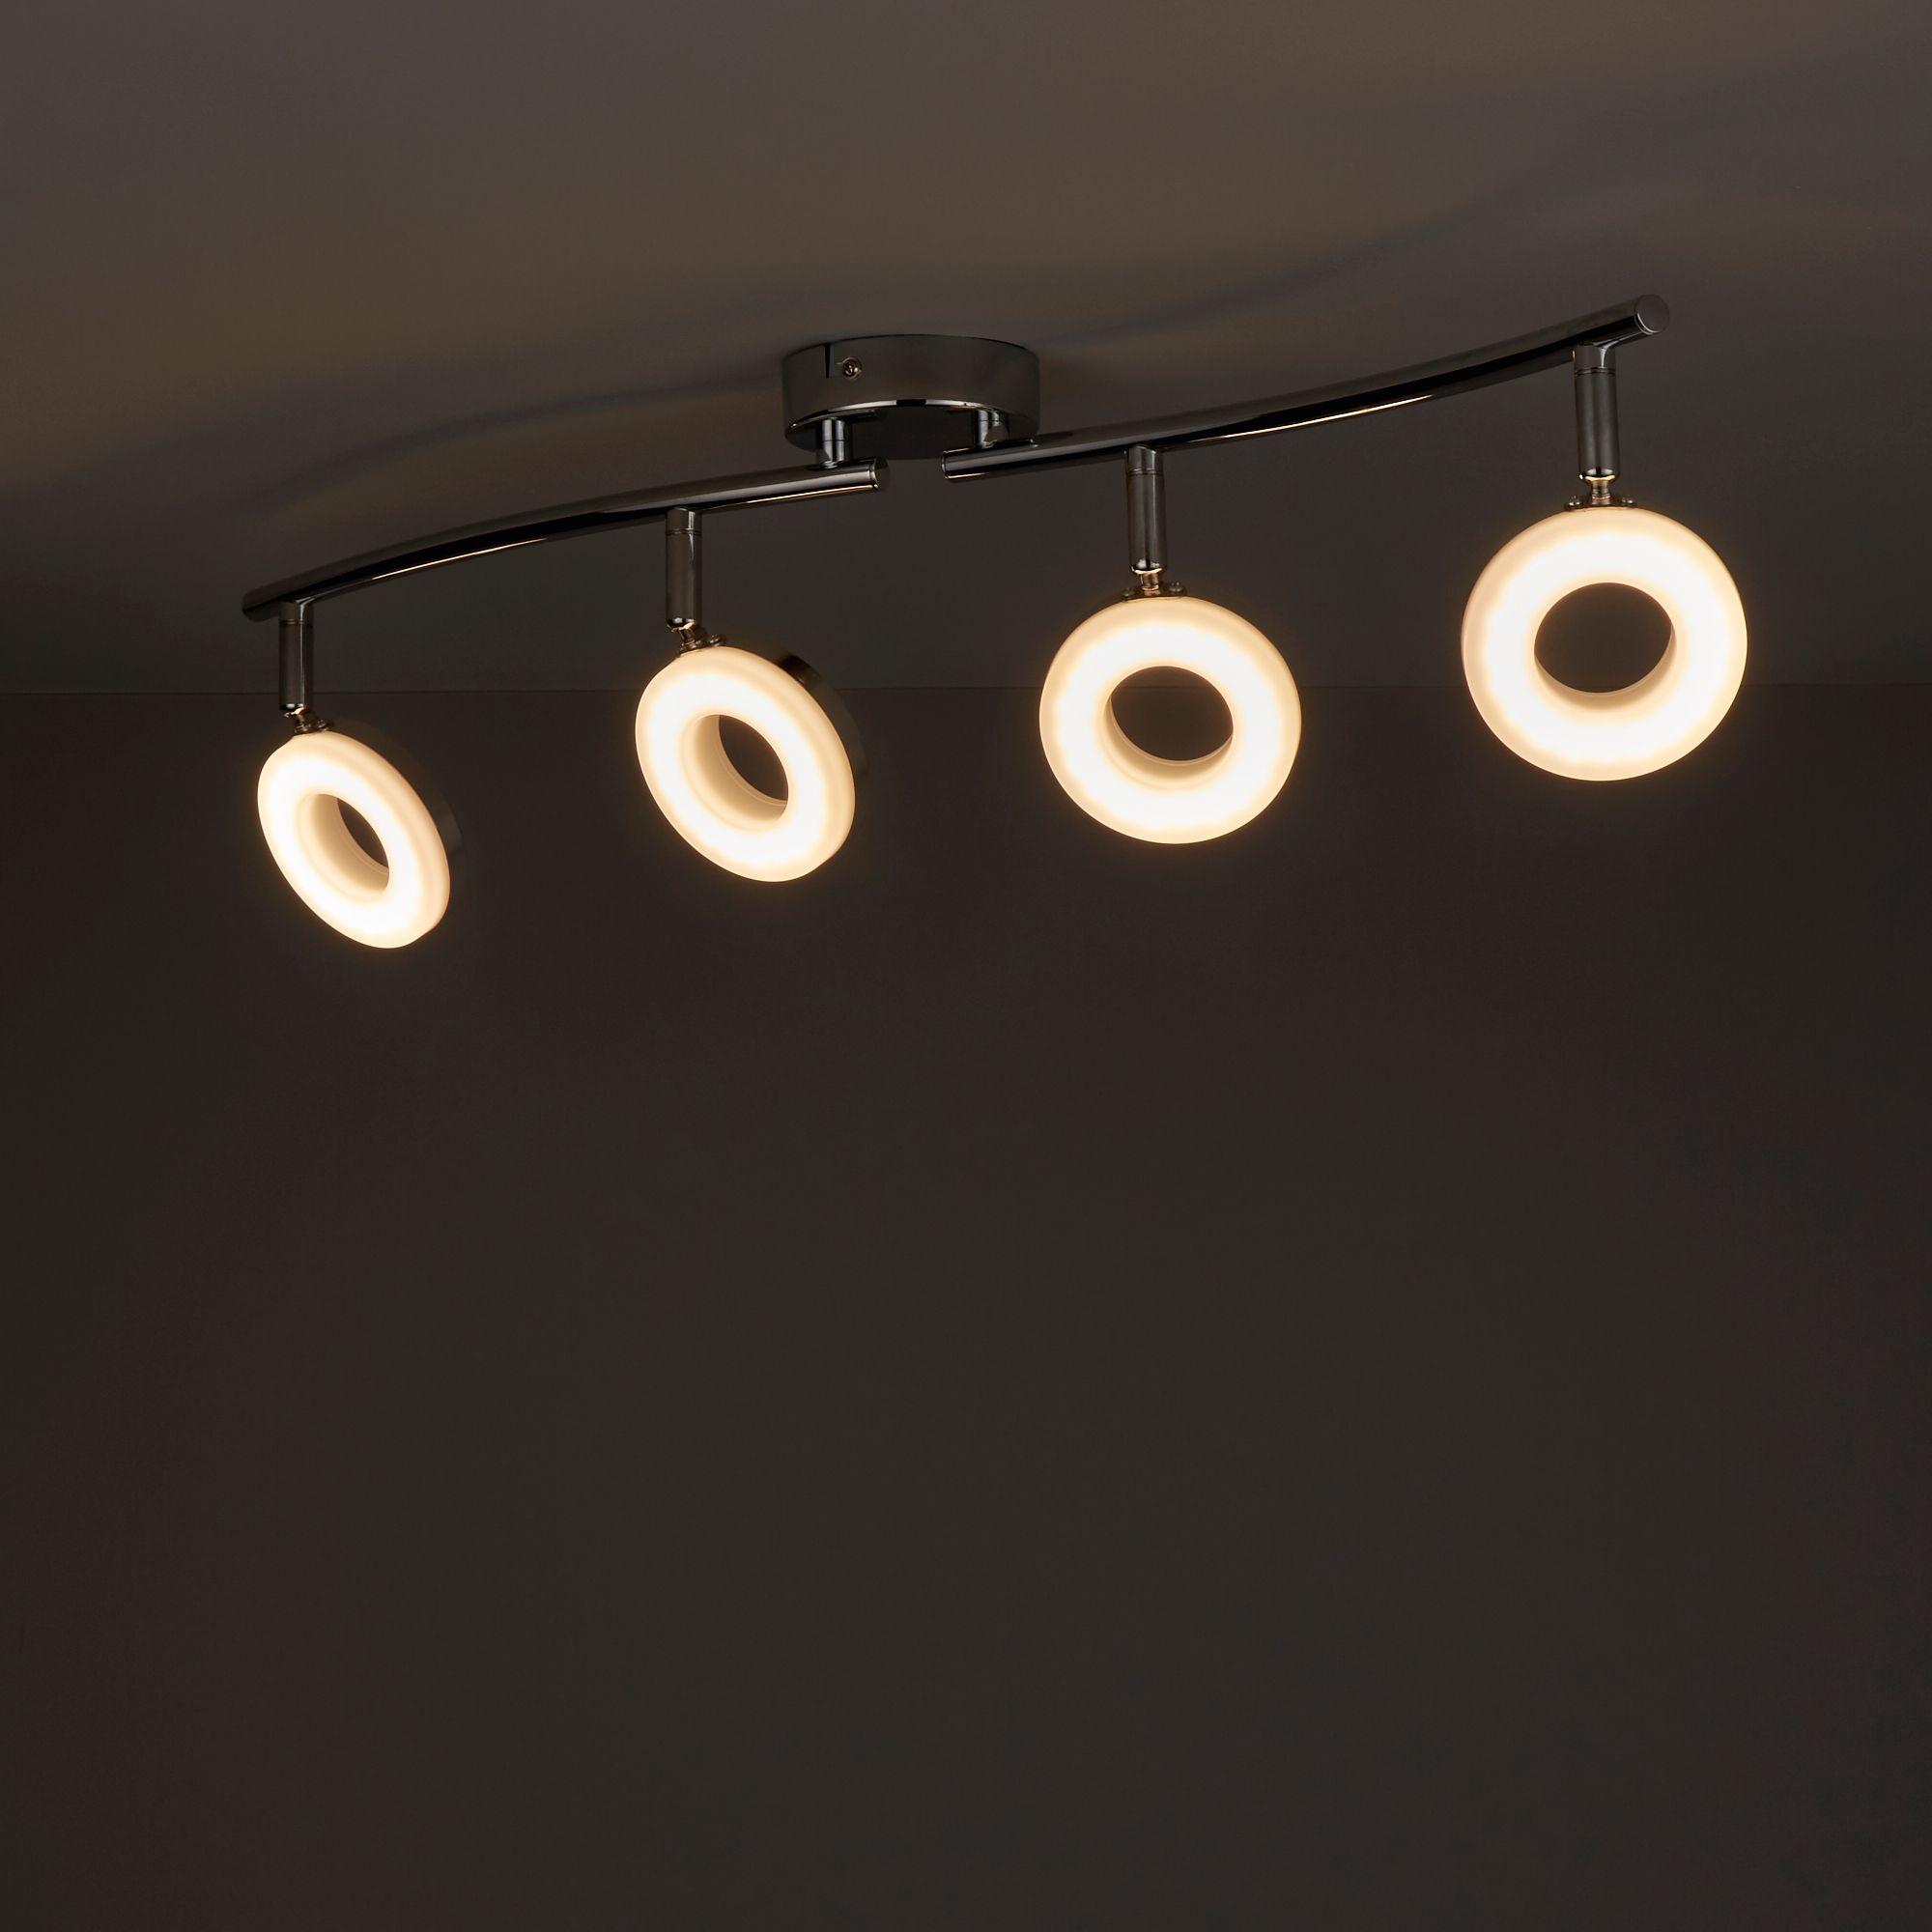 Muesis Chrome effect 4 Lamp Spotlight